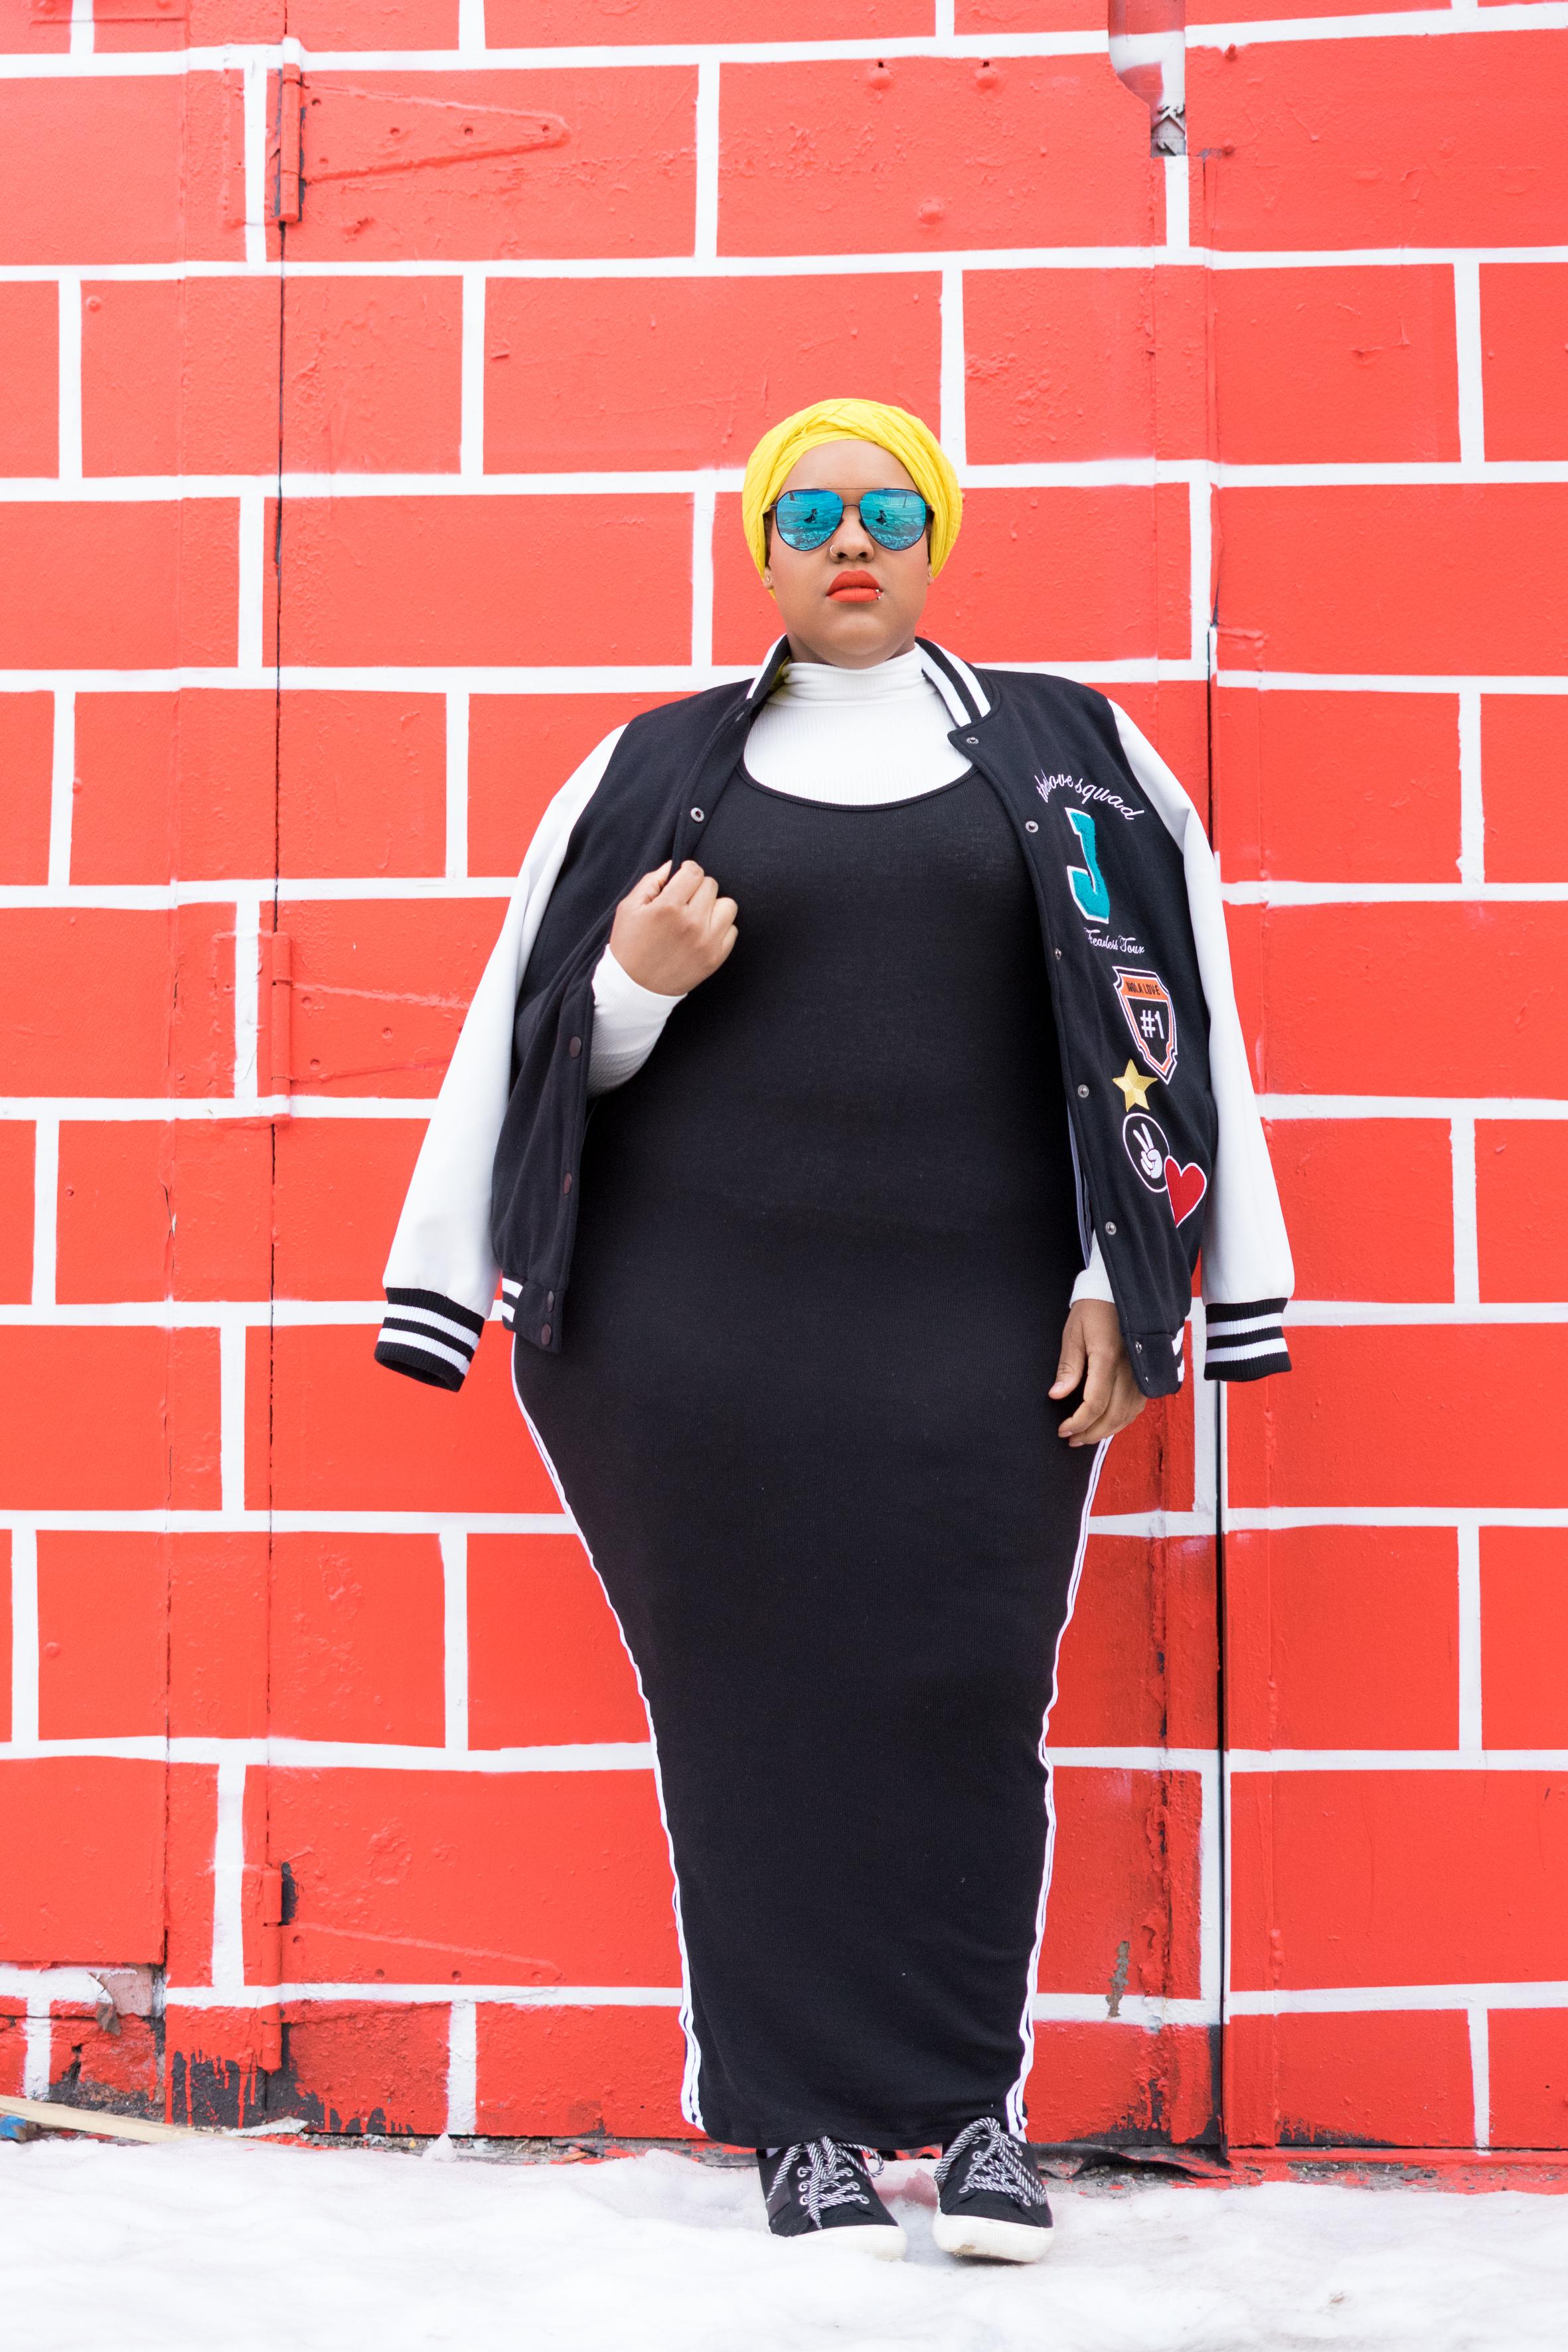 Leah-Vernon-Black-Muslim-Plus-Size-Body-Positive-Model-DIFF-Eyewear-Detroit-Blogger-3 (1)